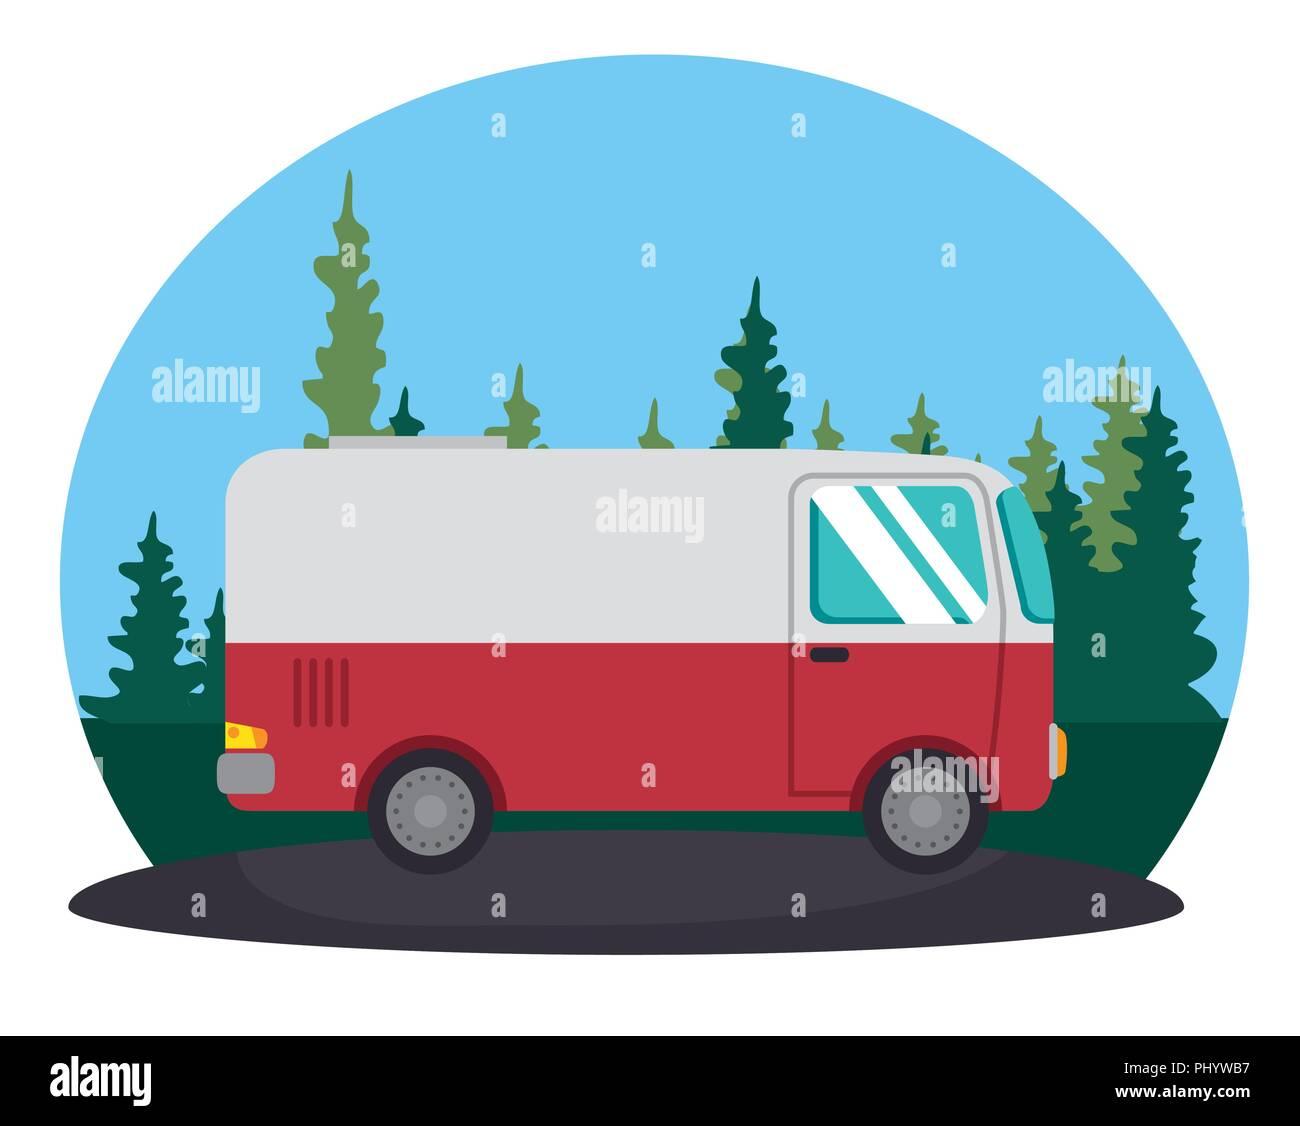 van vehicle transport icon vector illustration design - Stock Image